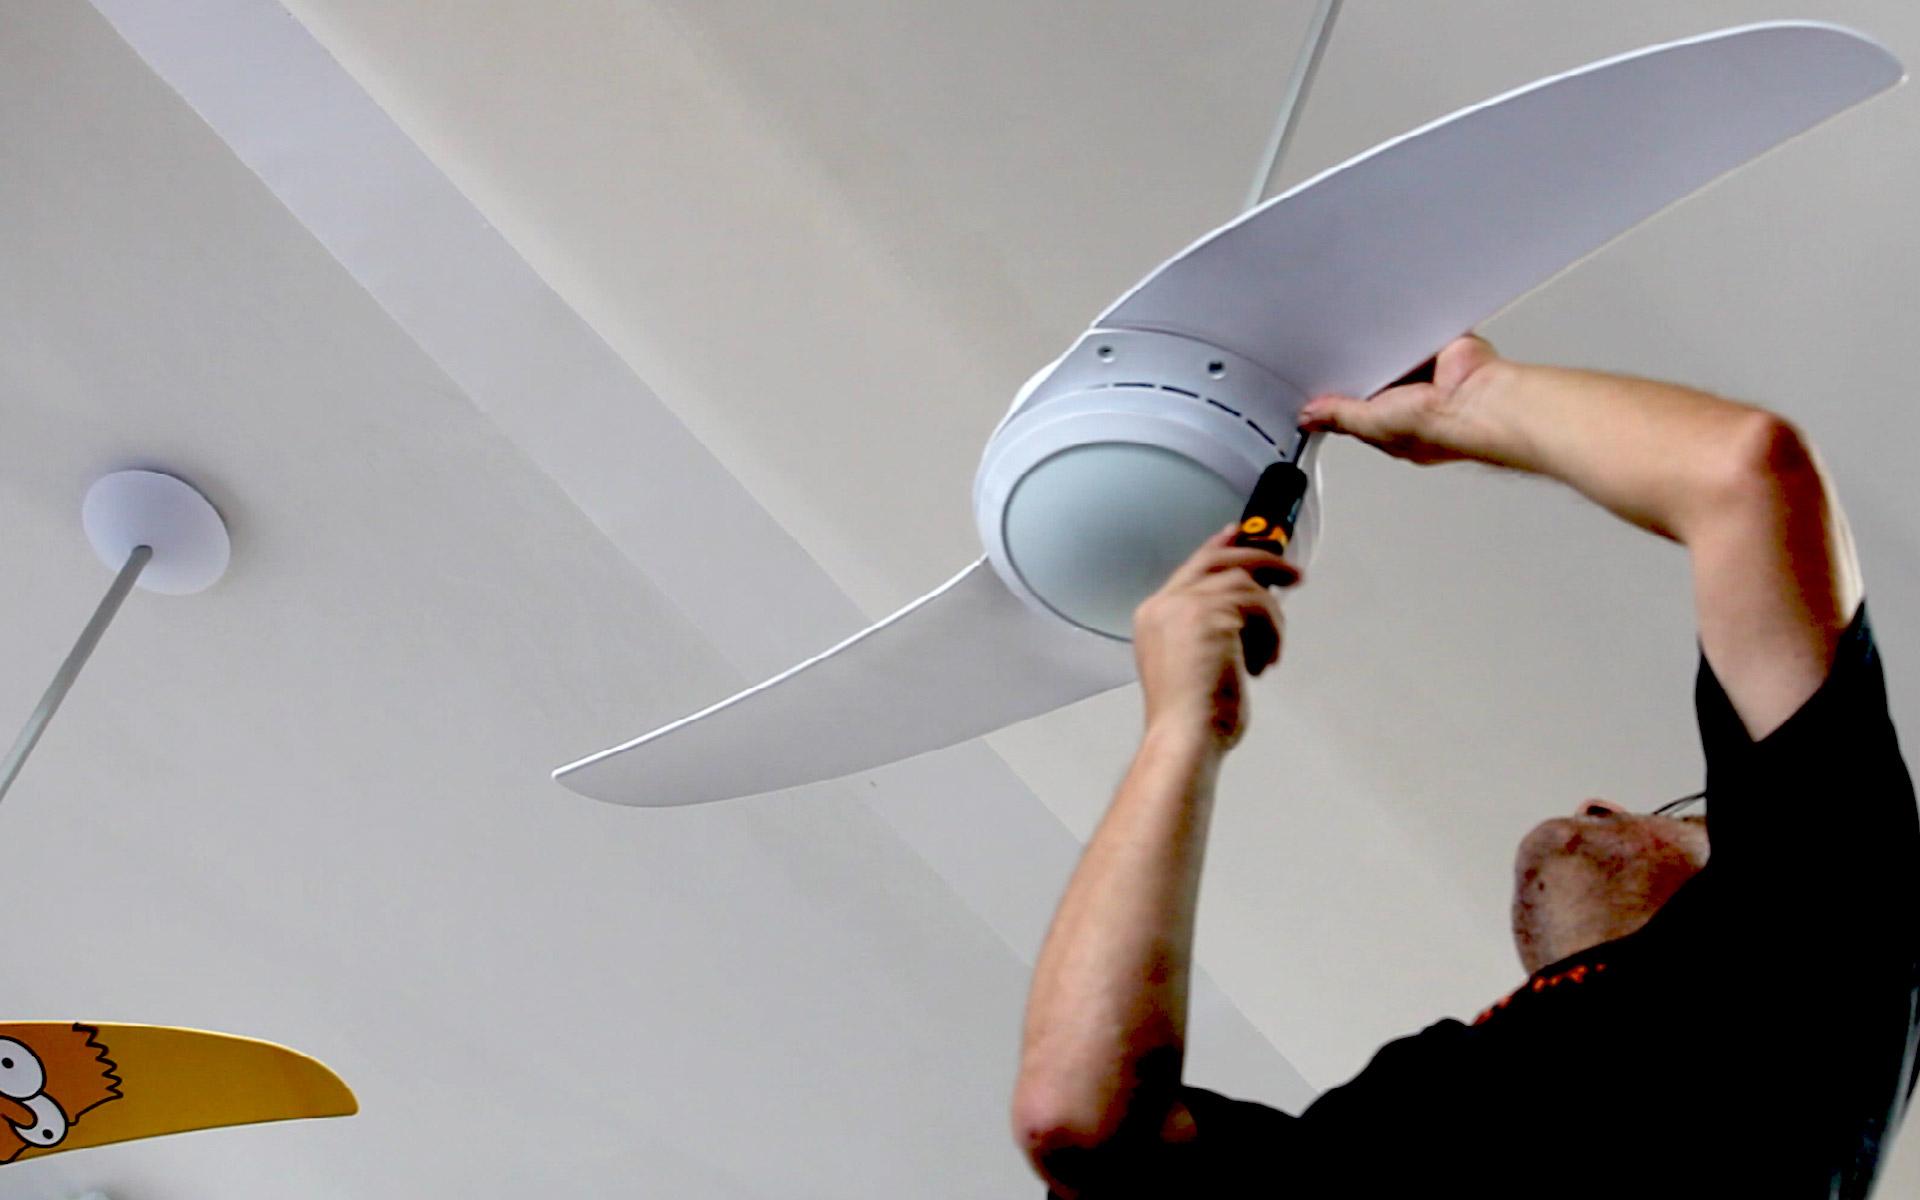 Ventilador de teto Spirit - Blog Myspirit - instalar ventilador de teto